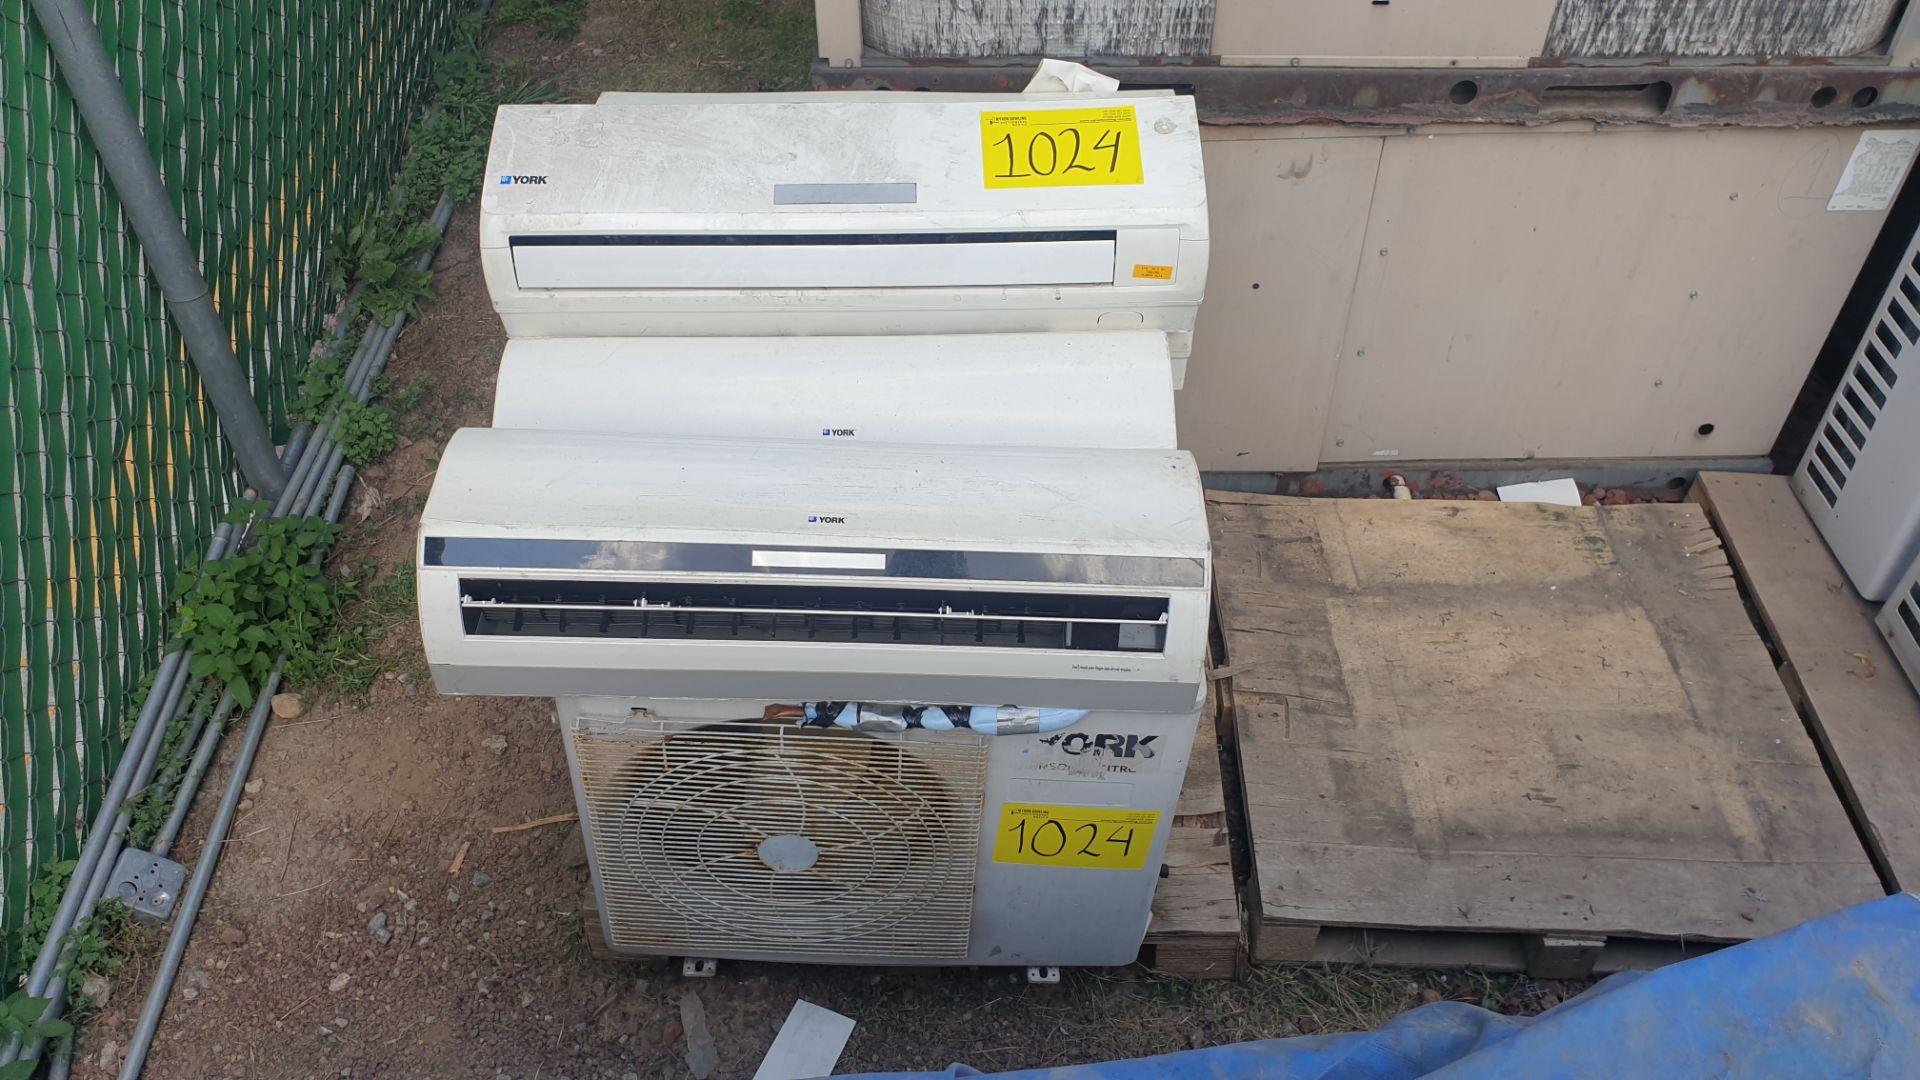 4 York Condensing units, includes 5 York minisplit, models YHEC12FS-ADG, YSEC12FD-ADG - Image 2 of 7